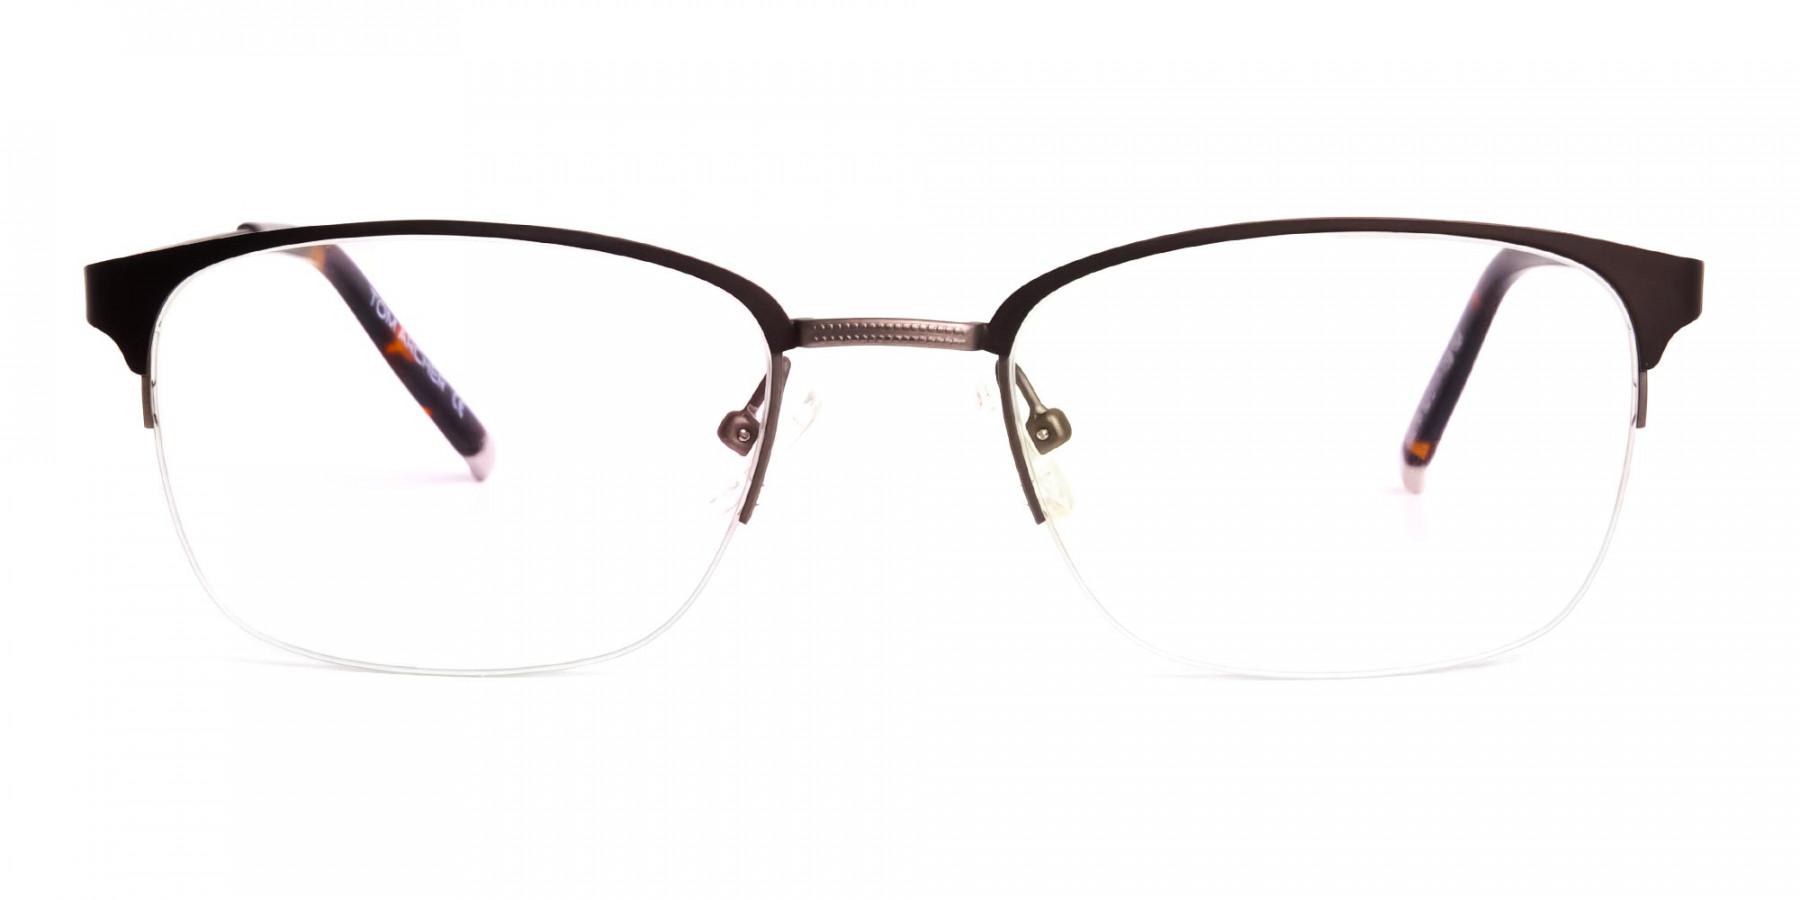 matte-brown-half-rim-rectangular-glasses-frames-1